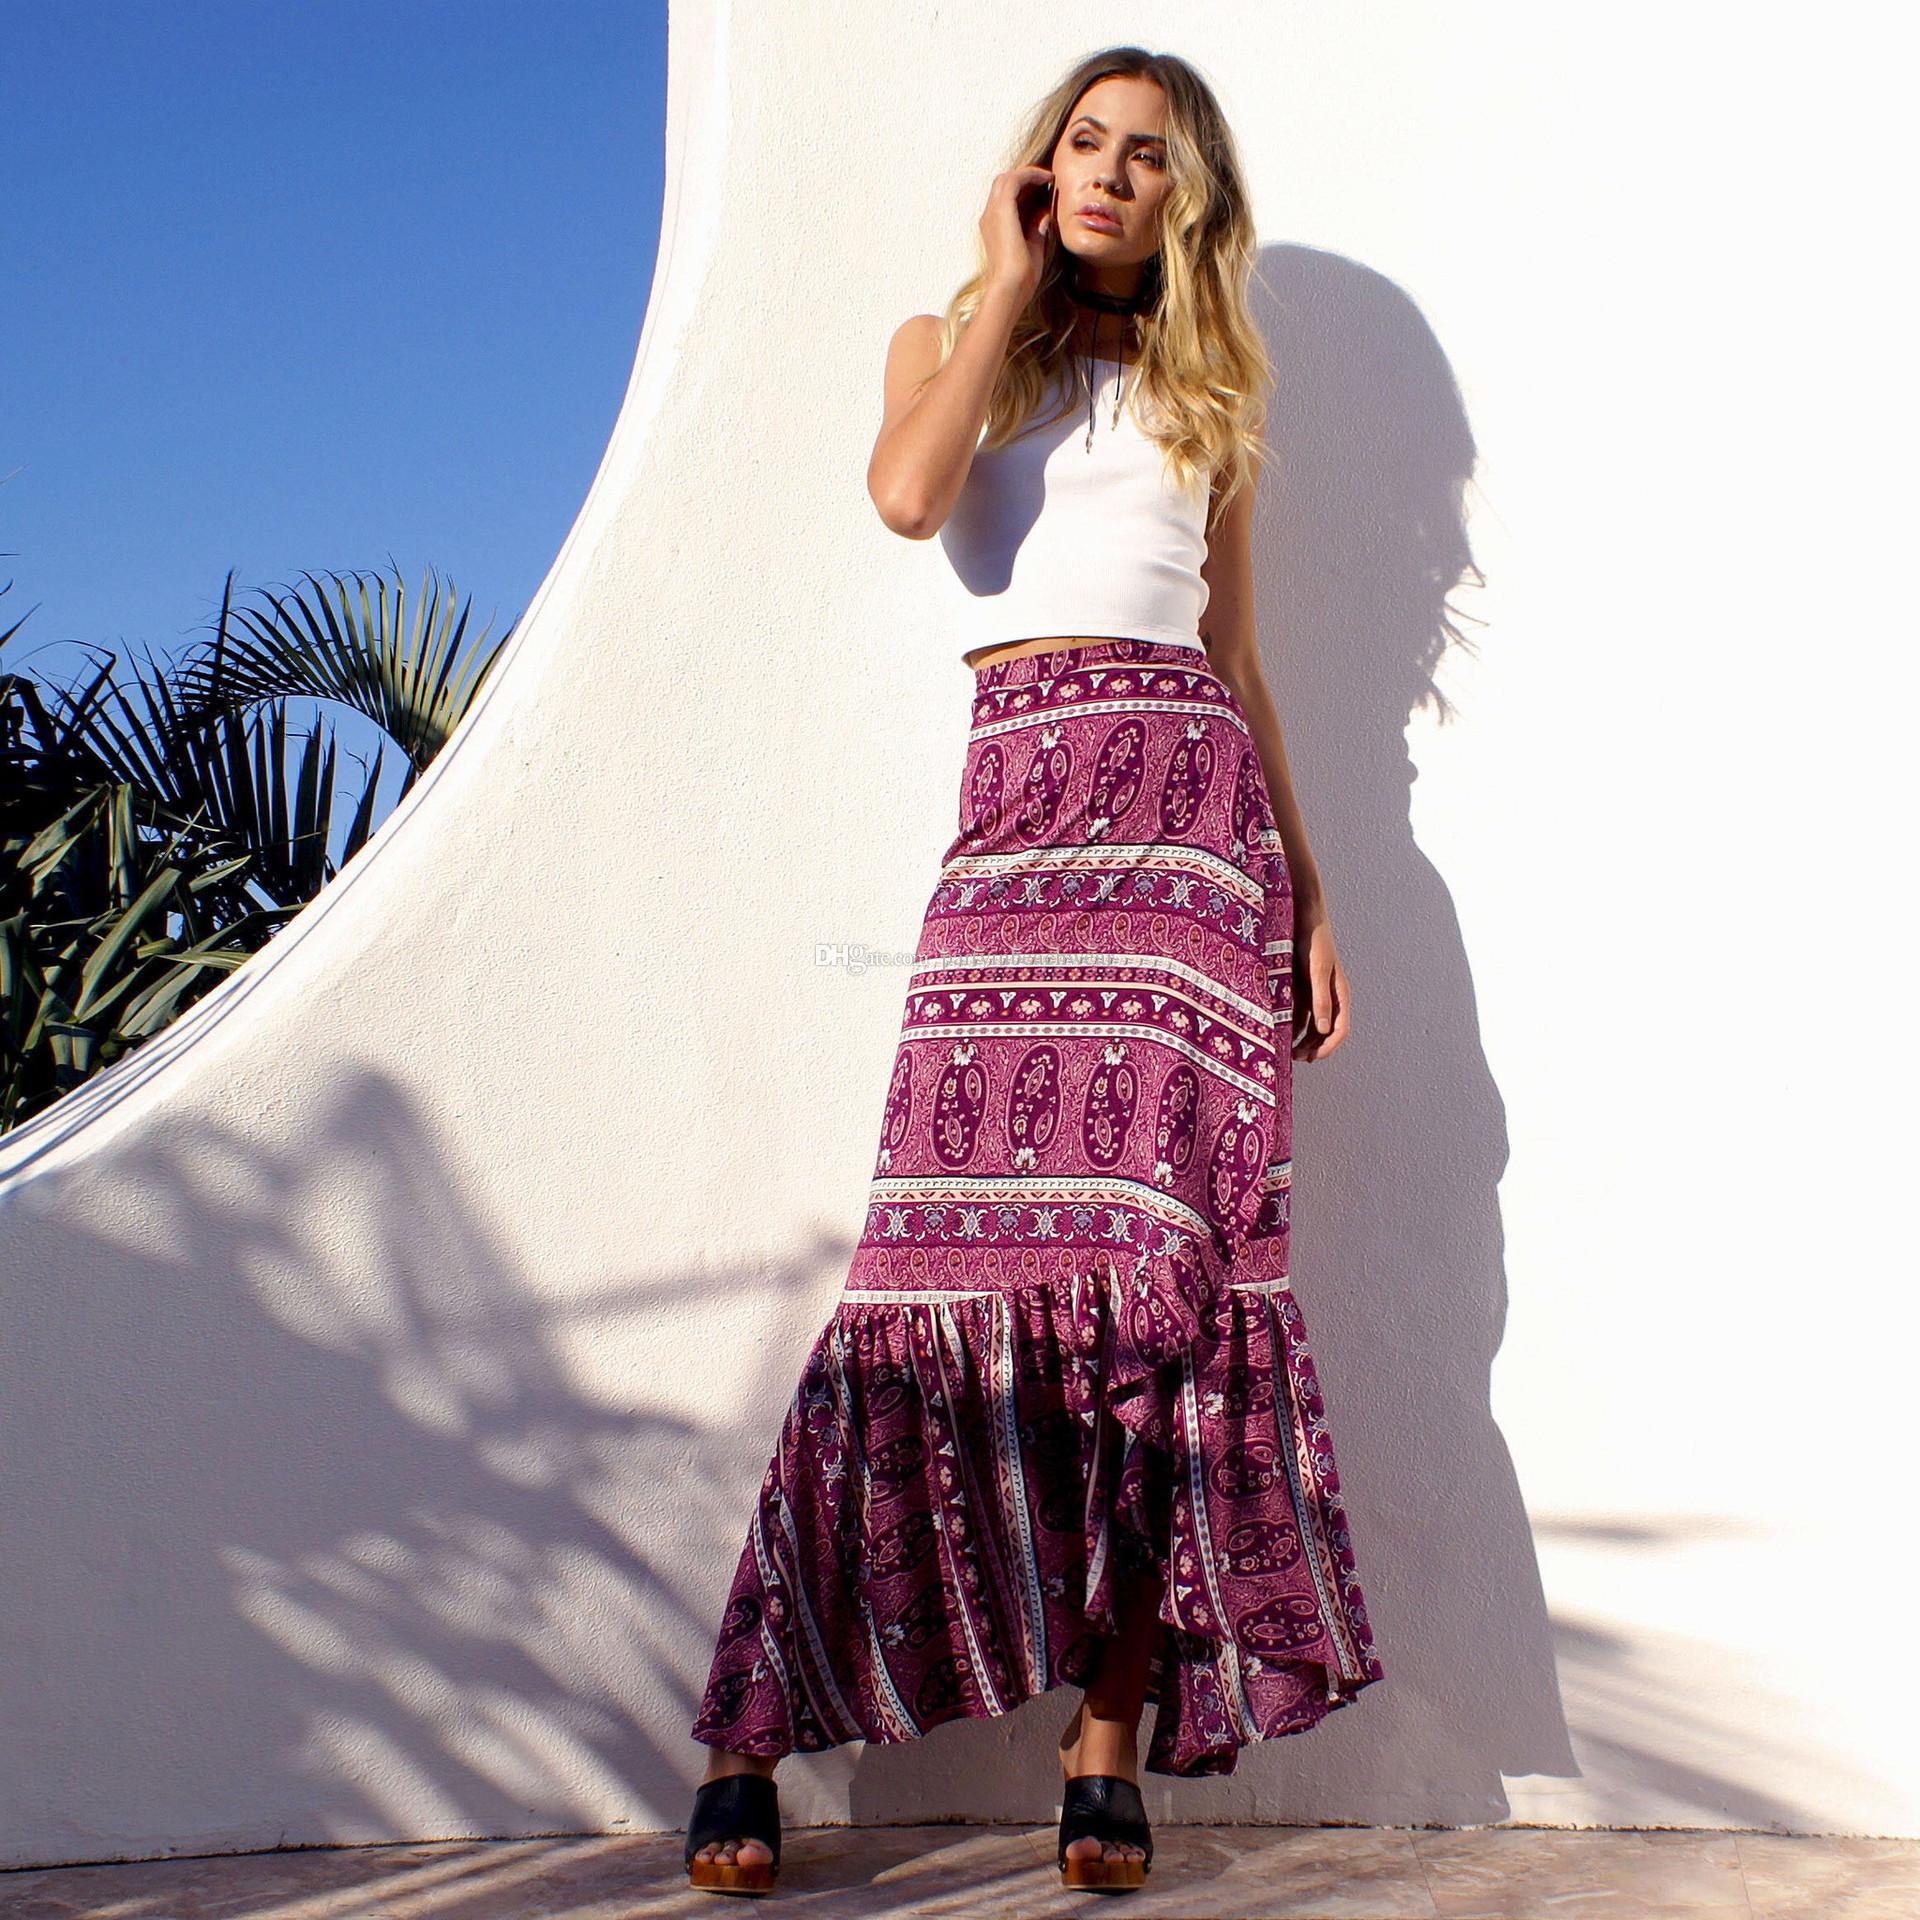 5eaedbde393 Fashion Summer Holiday Irregular Skirt Wrap Dresses Women Sexy Boho ...